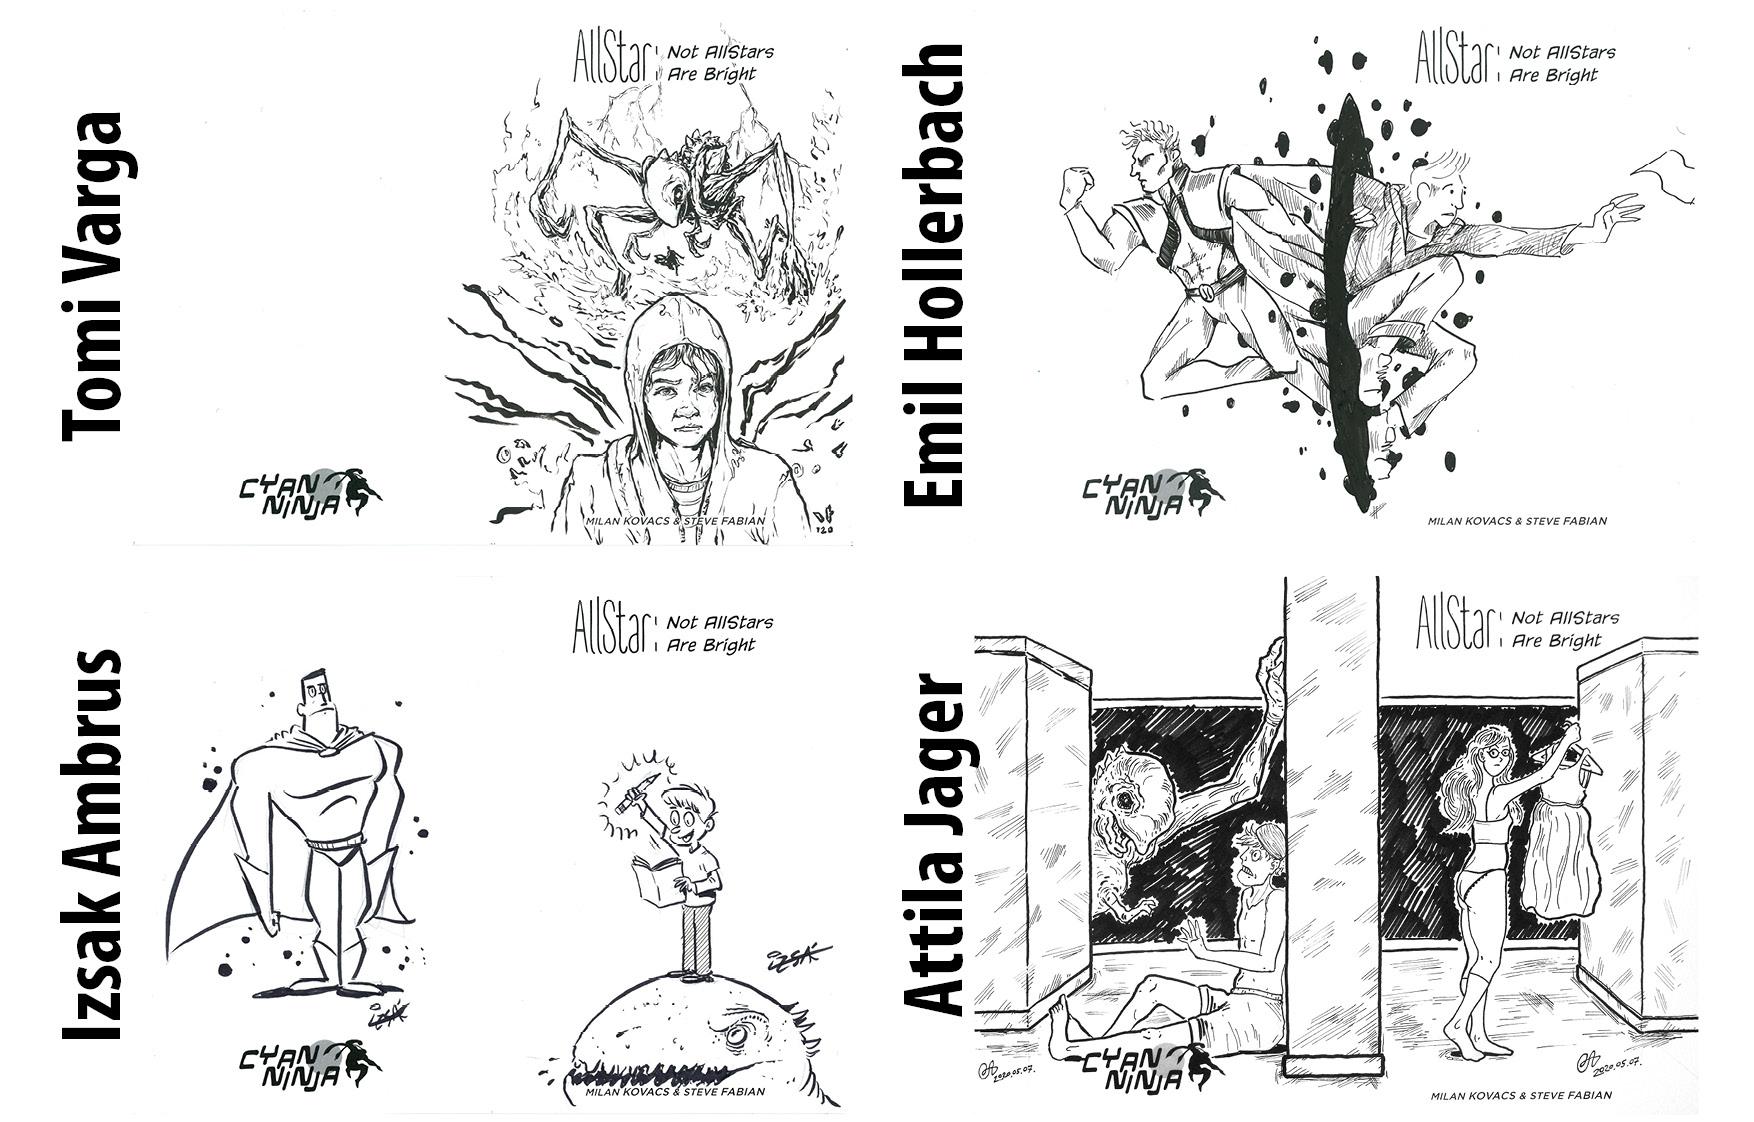 AllStar-Sketch_cover_samples